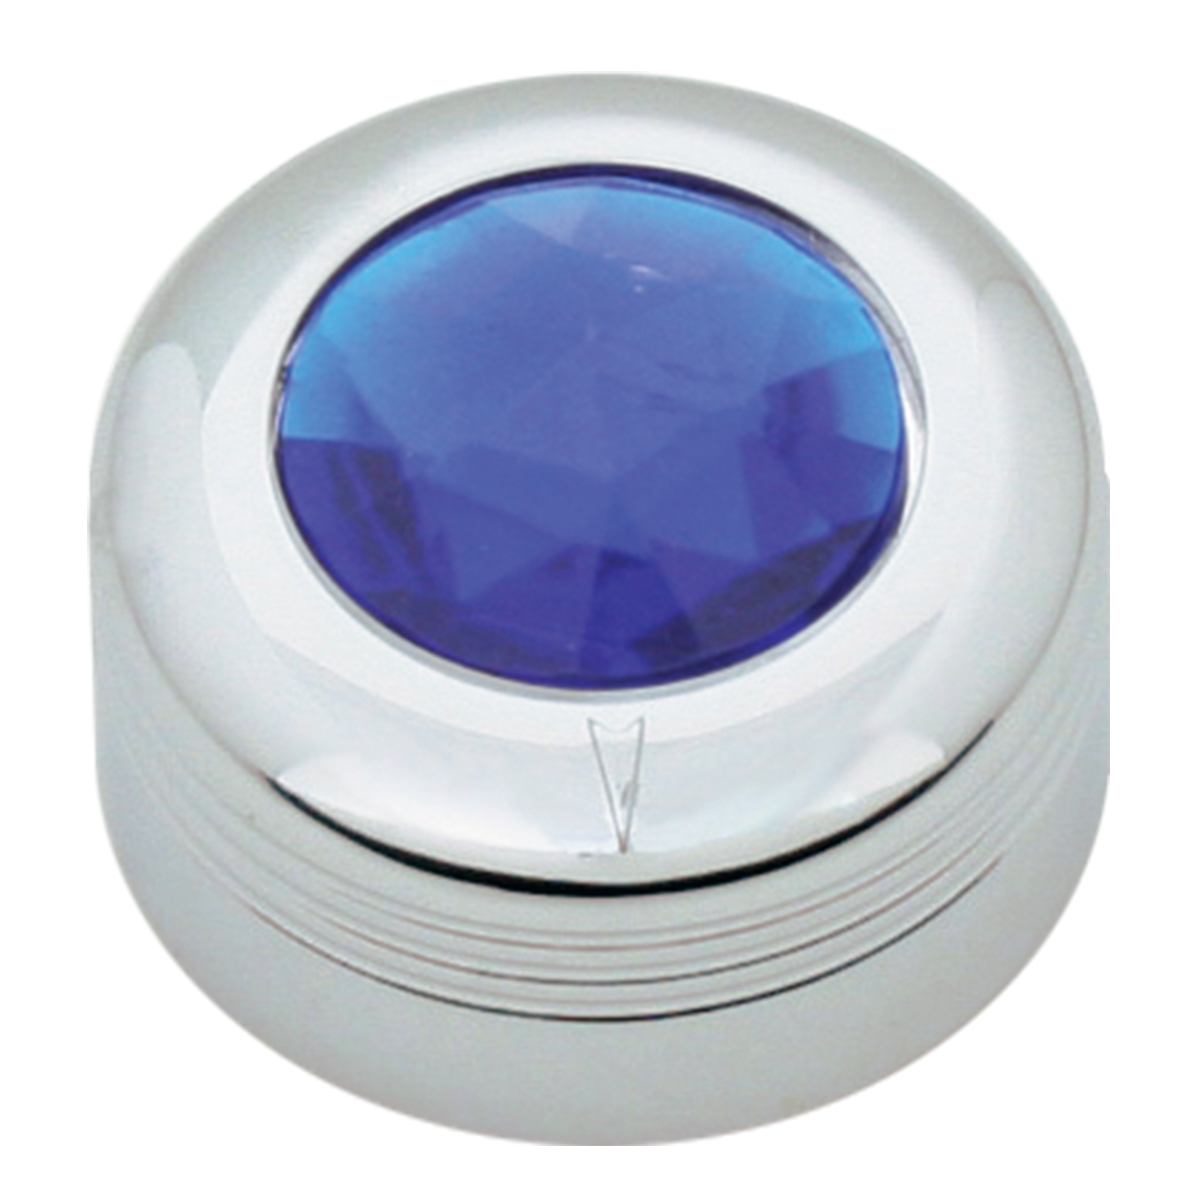 Chrome Plastic A/C Knob w/ Blue Plastic Crystal for Pete